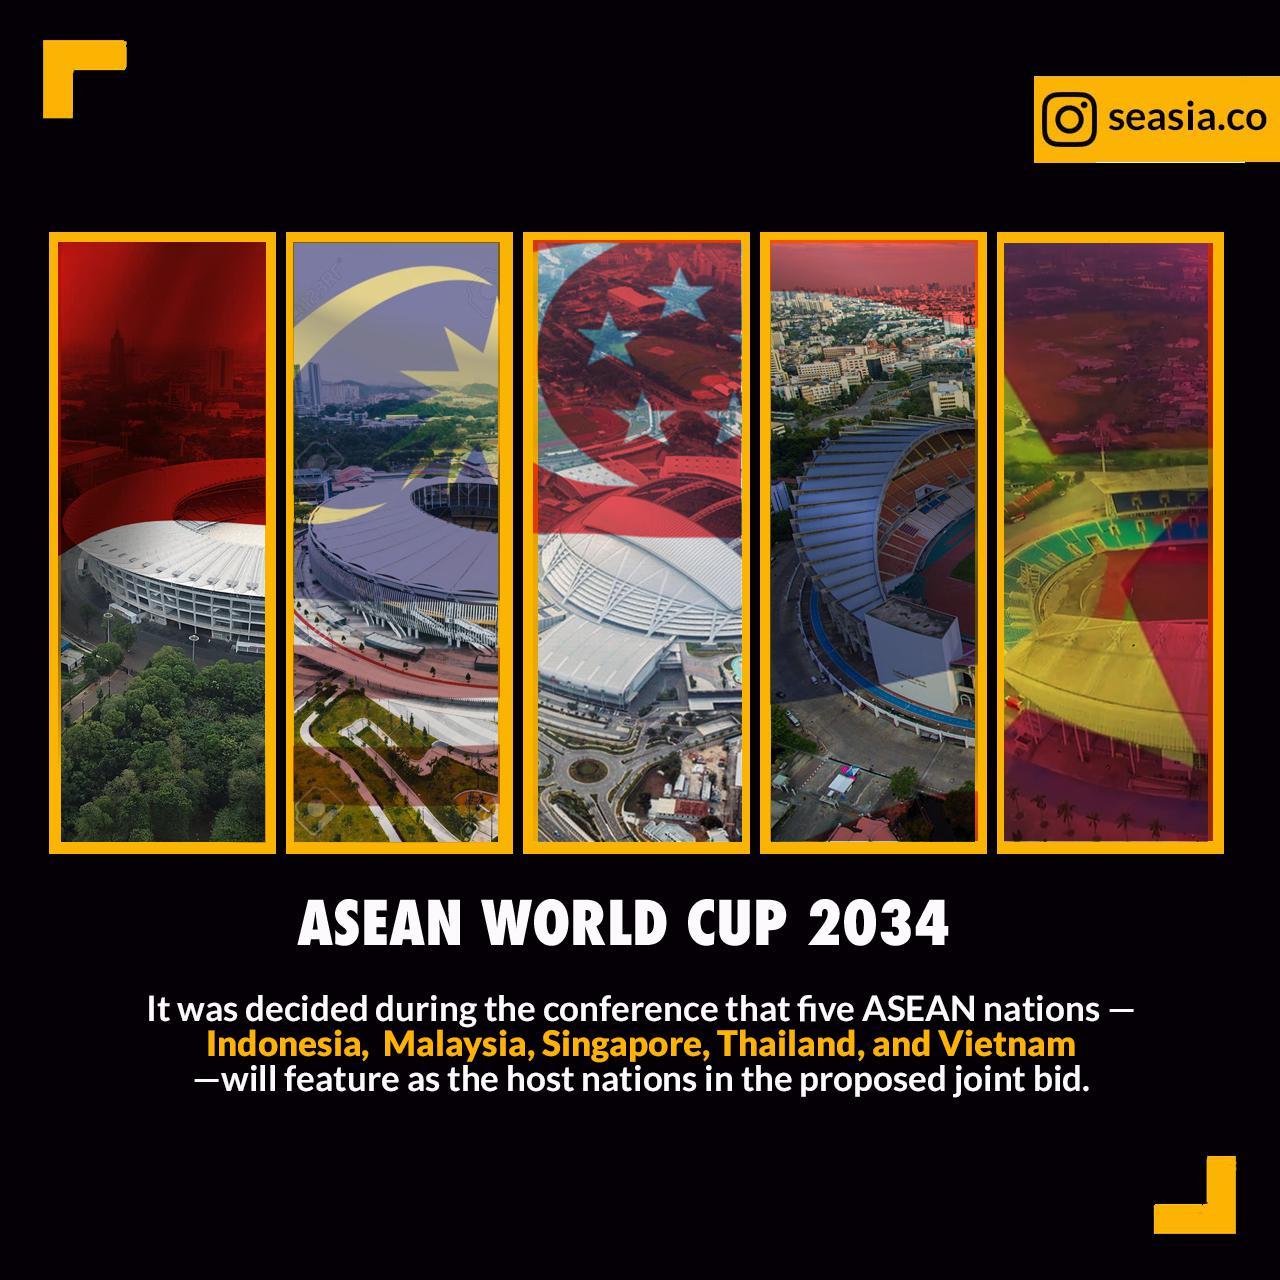 Inilah Lima Negara ASEAN Yang Diajukan Menjadi Tuan Rumah